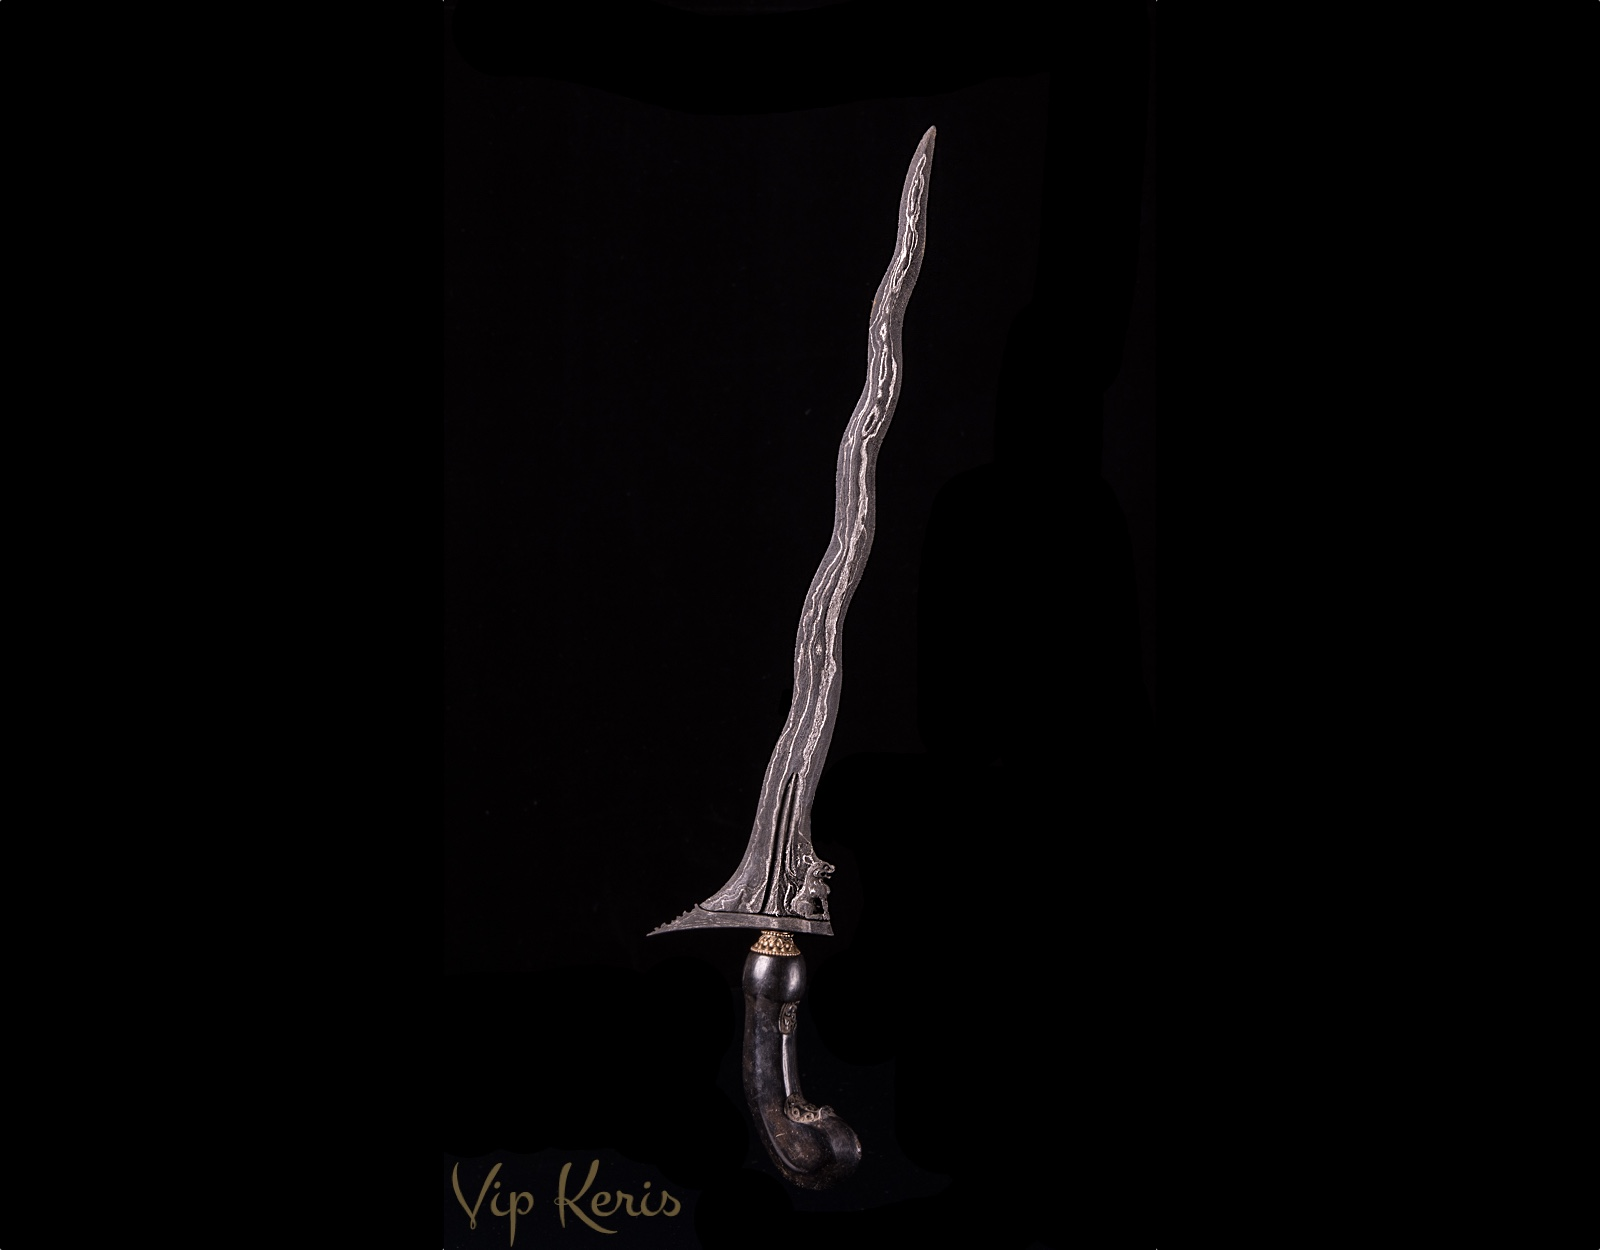 Кинжал Крис Singo barong (luk 9) фото VipKeris